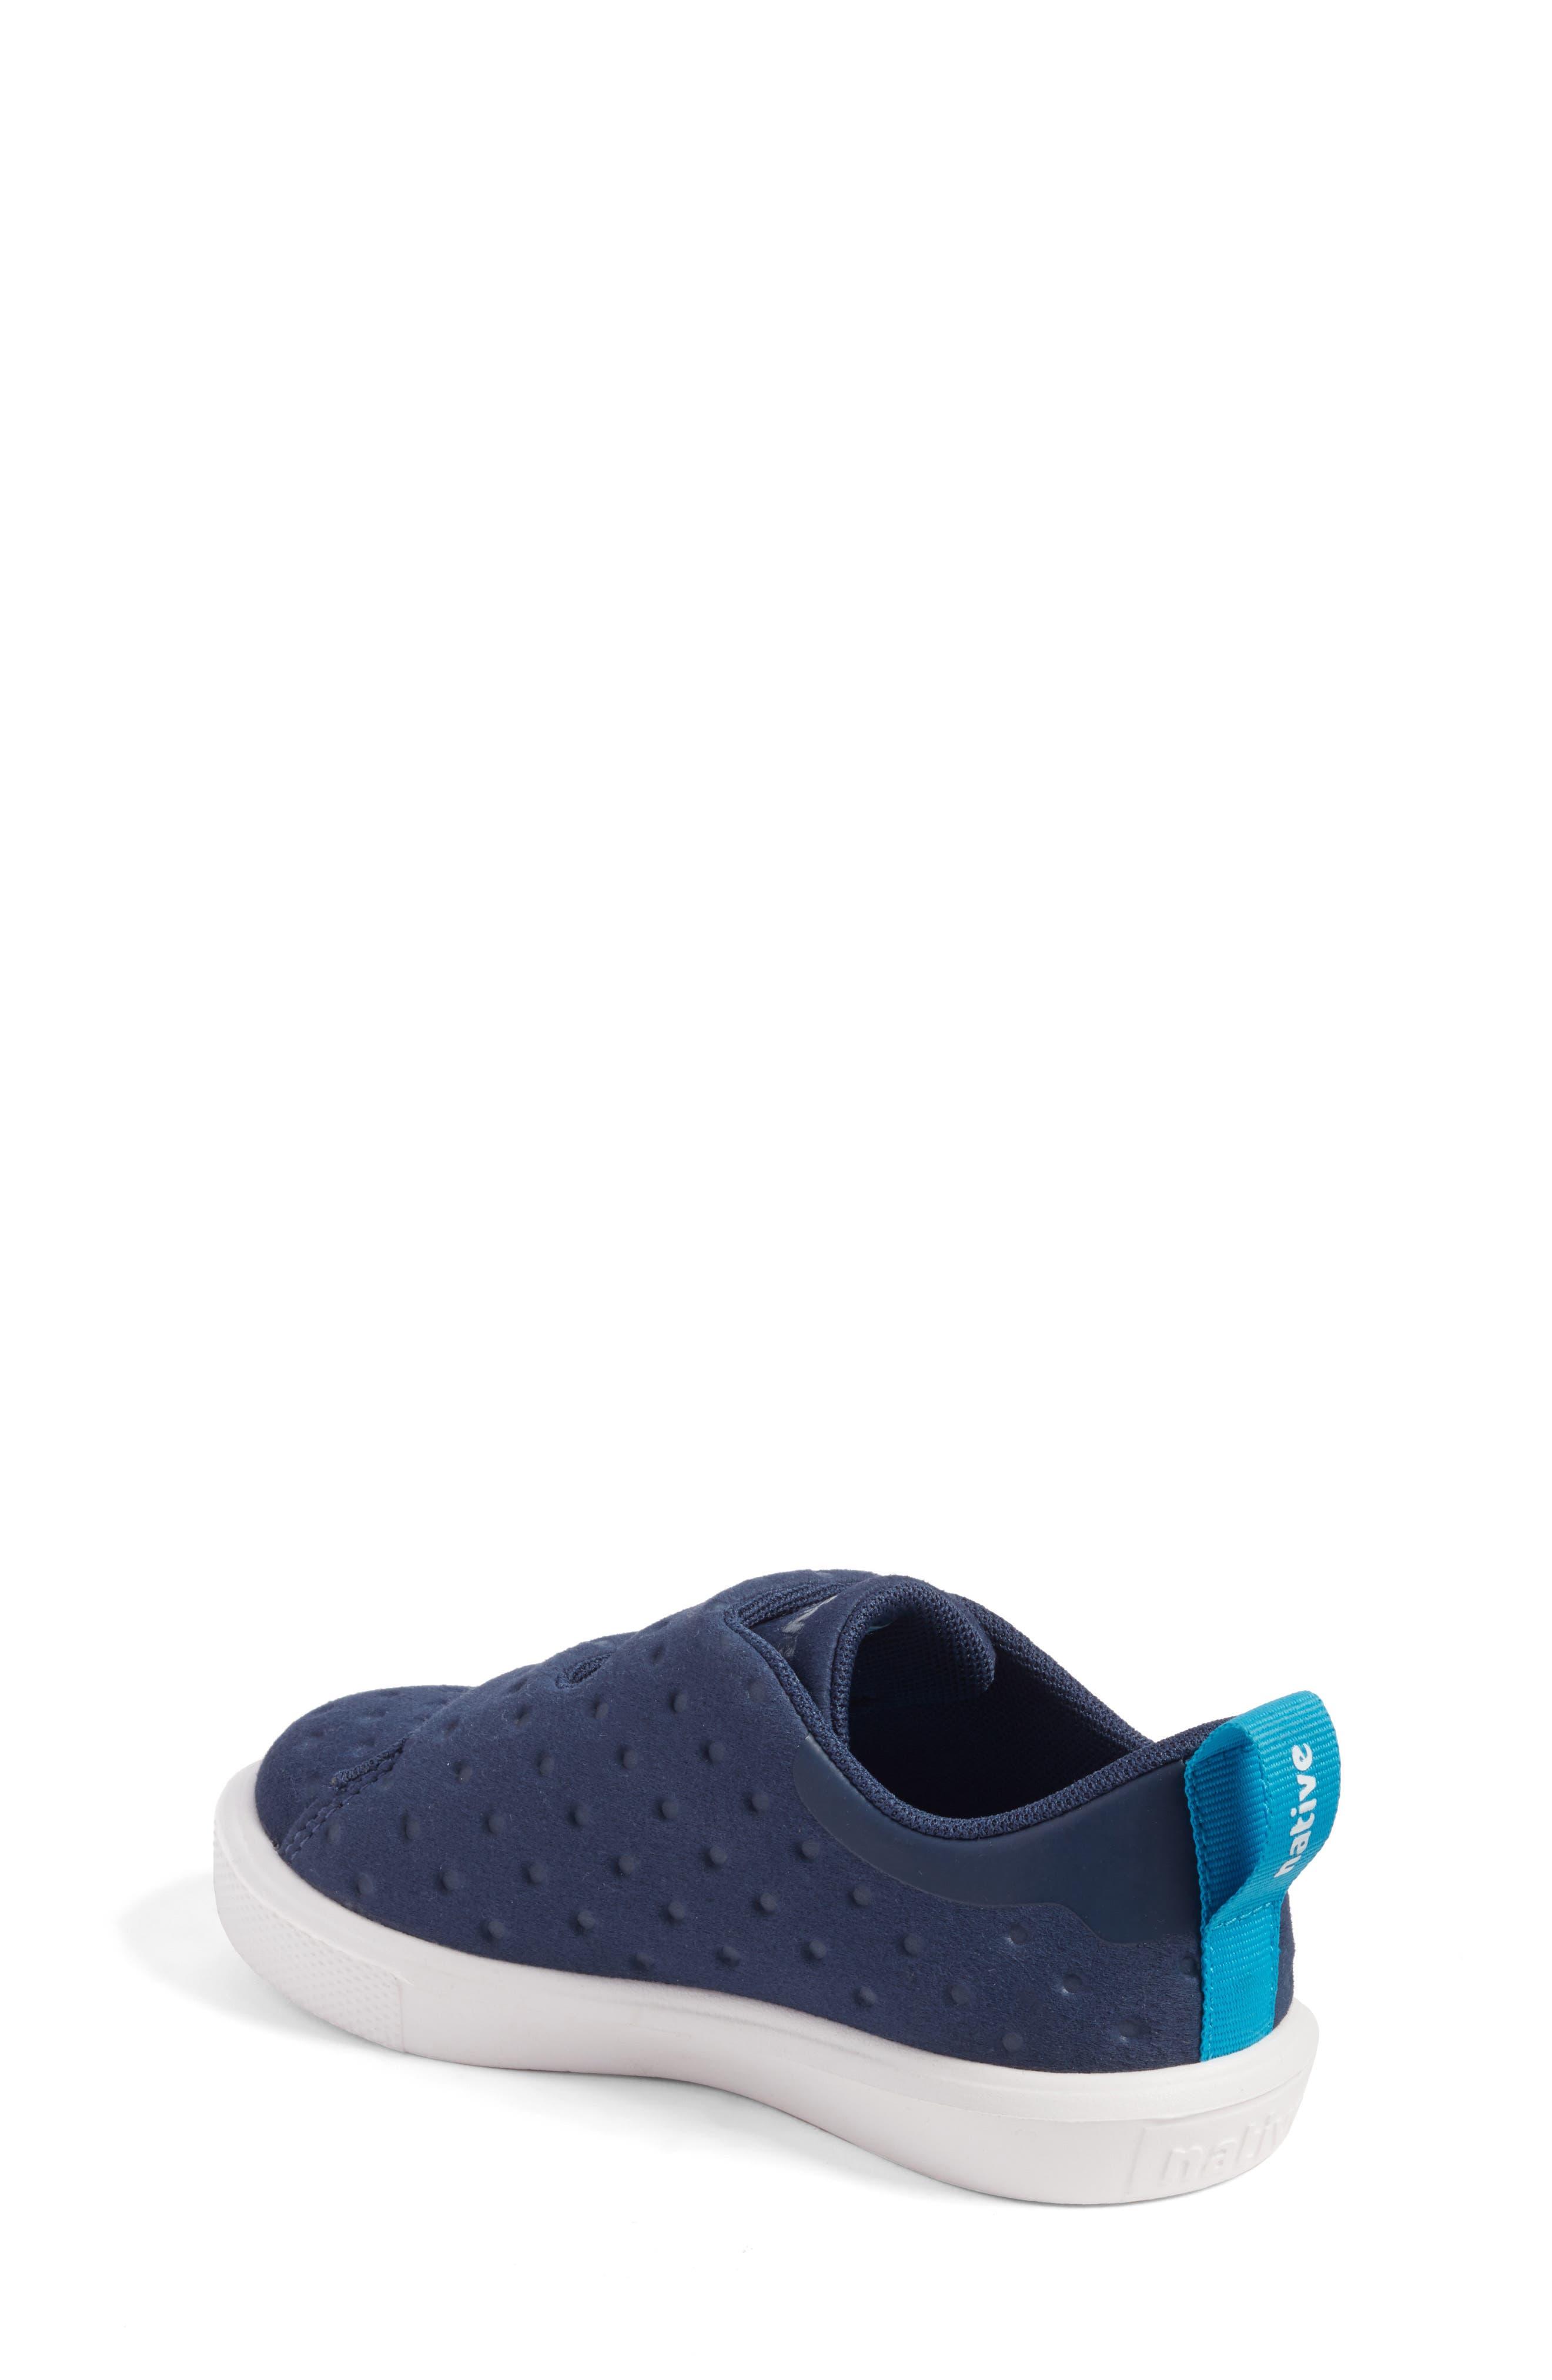 Alternate Image 2  - Native Shoes Monaco Sneaker (Walker, Toddler & Little Kid)